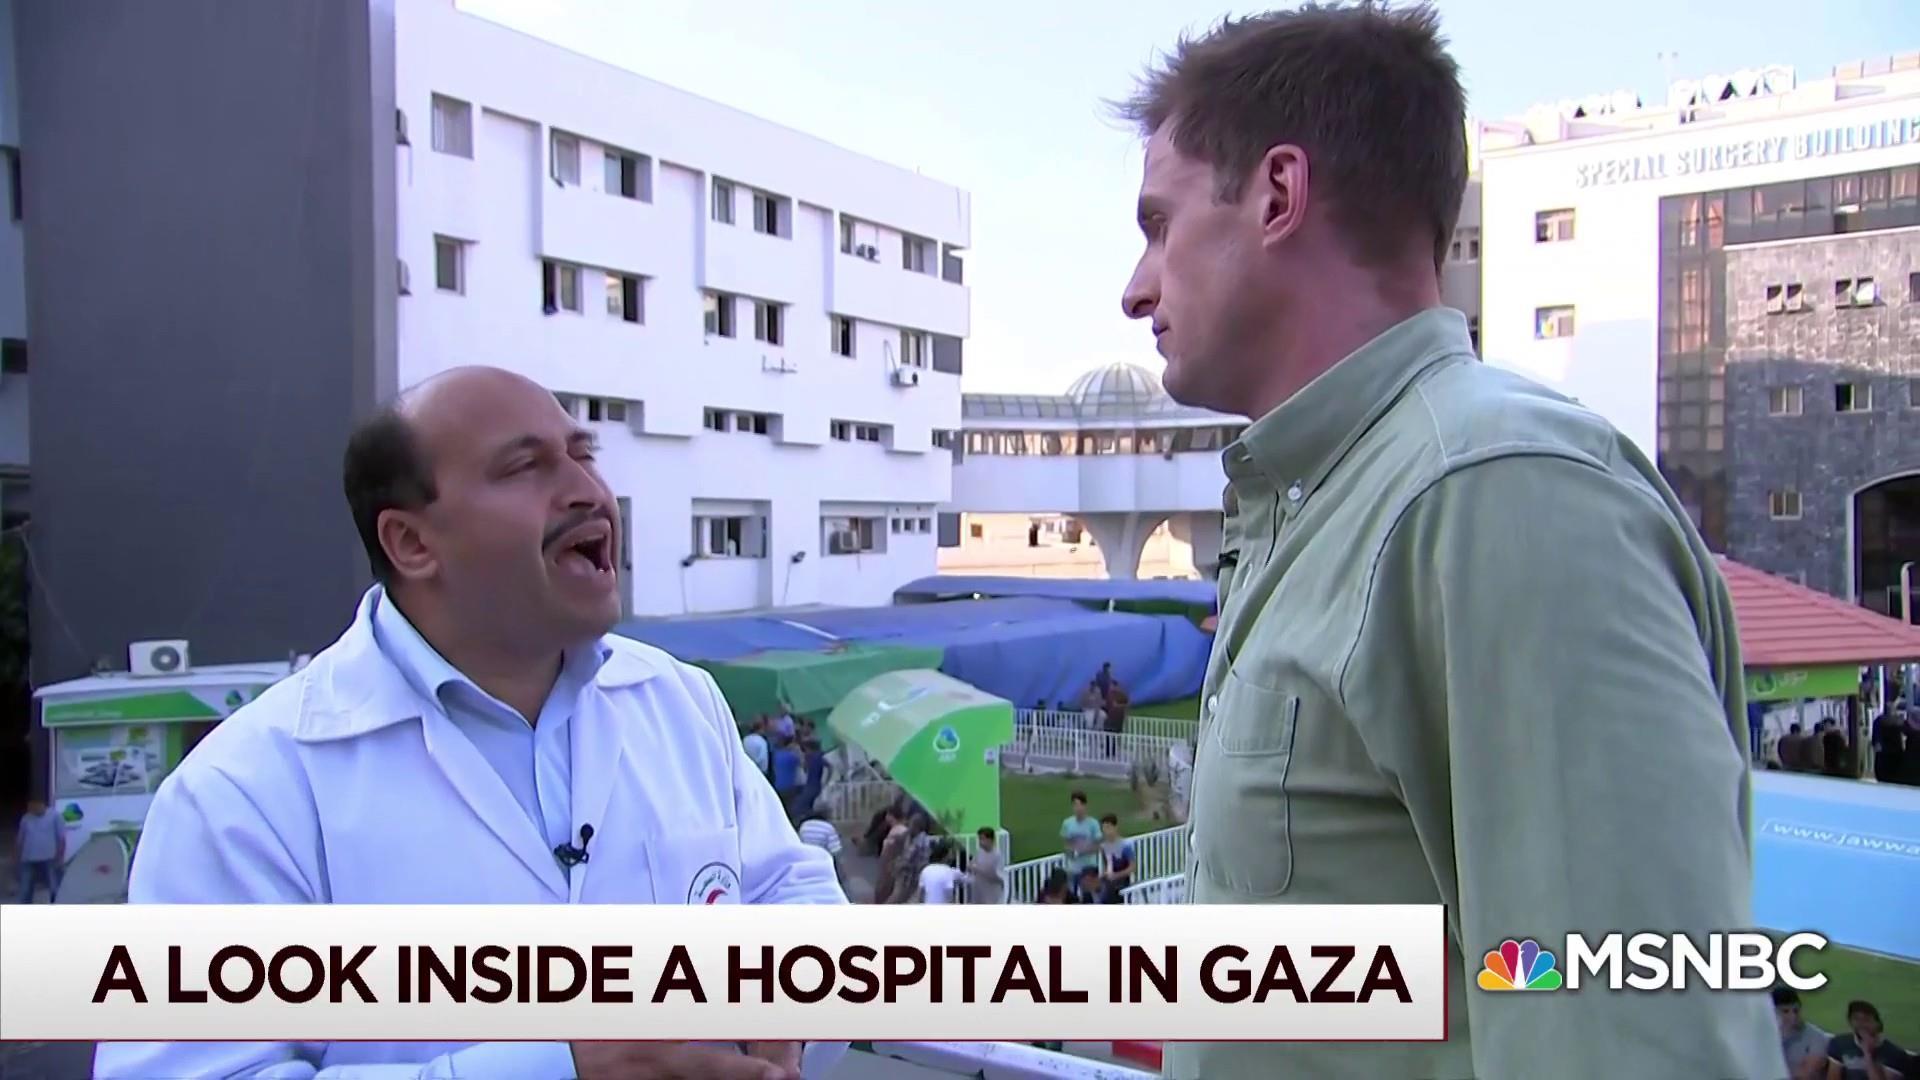 A look inside a hospital in Gaza